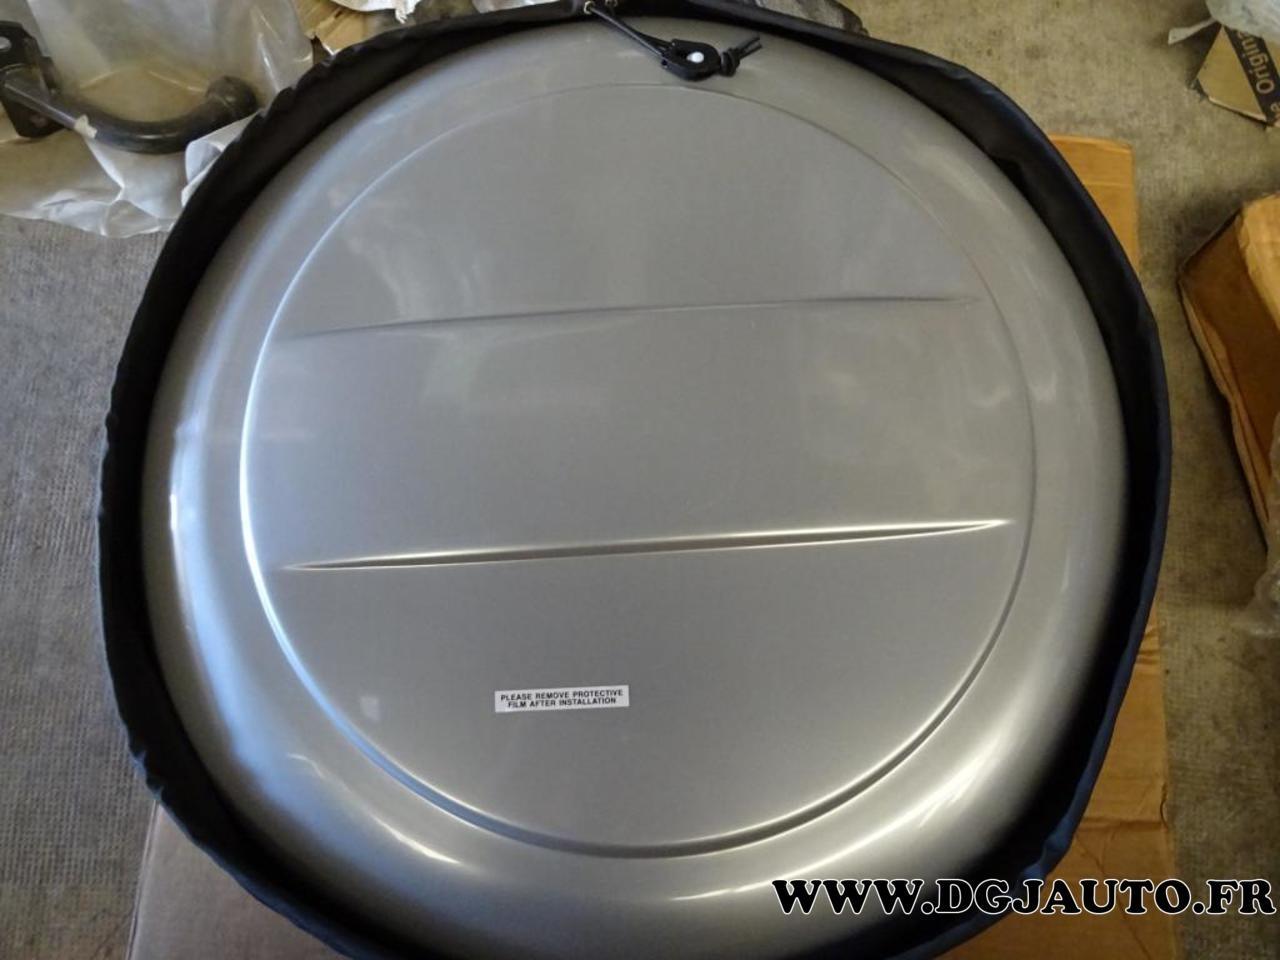 couvercle cache roue secours rigide 99000-990yb-740 pour suzuki grand vitara  - dgjauto